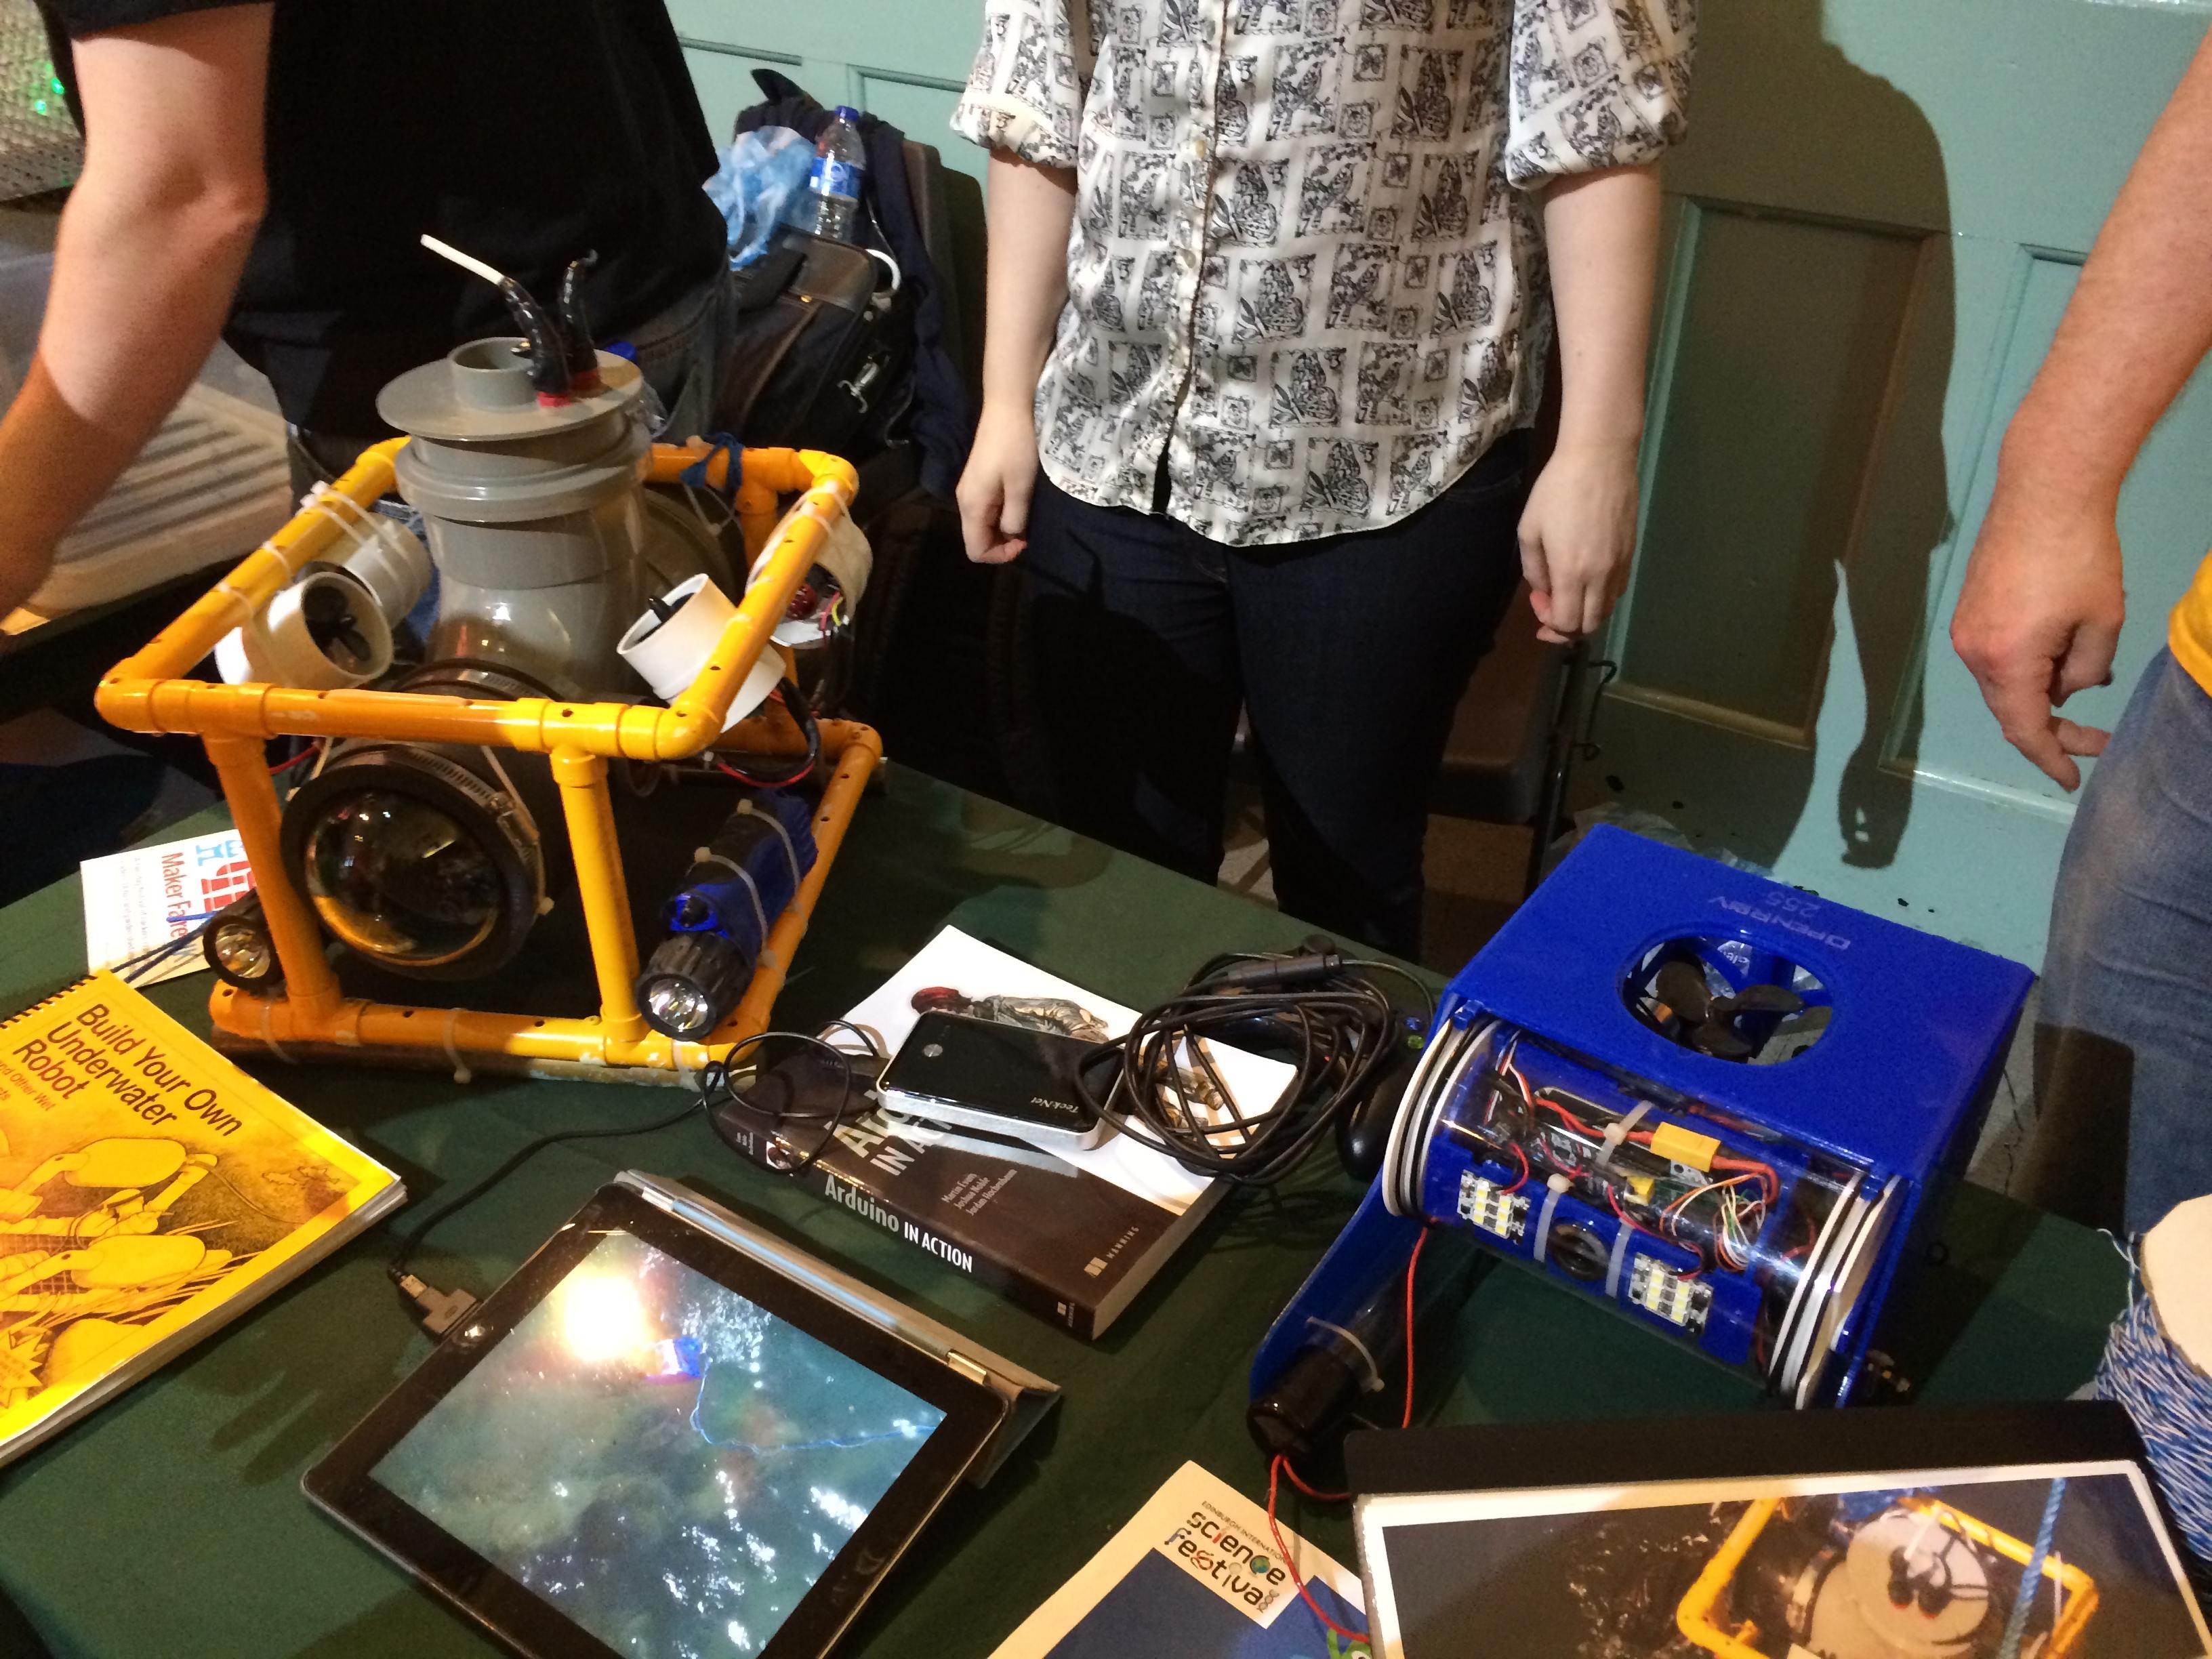 Underwater ROV at the Edinburgh mini Maker Faire